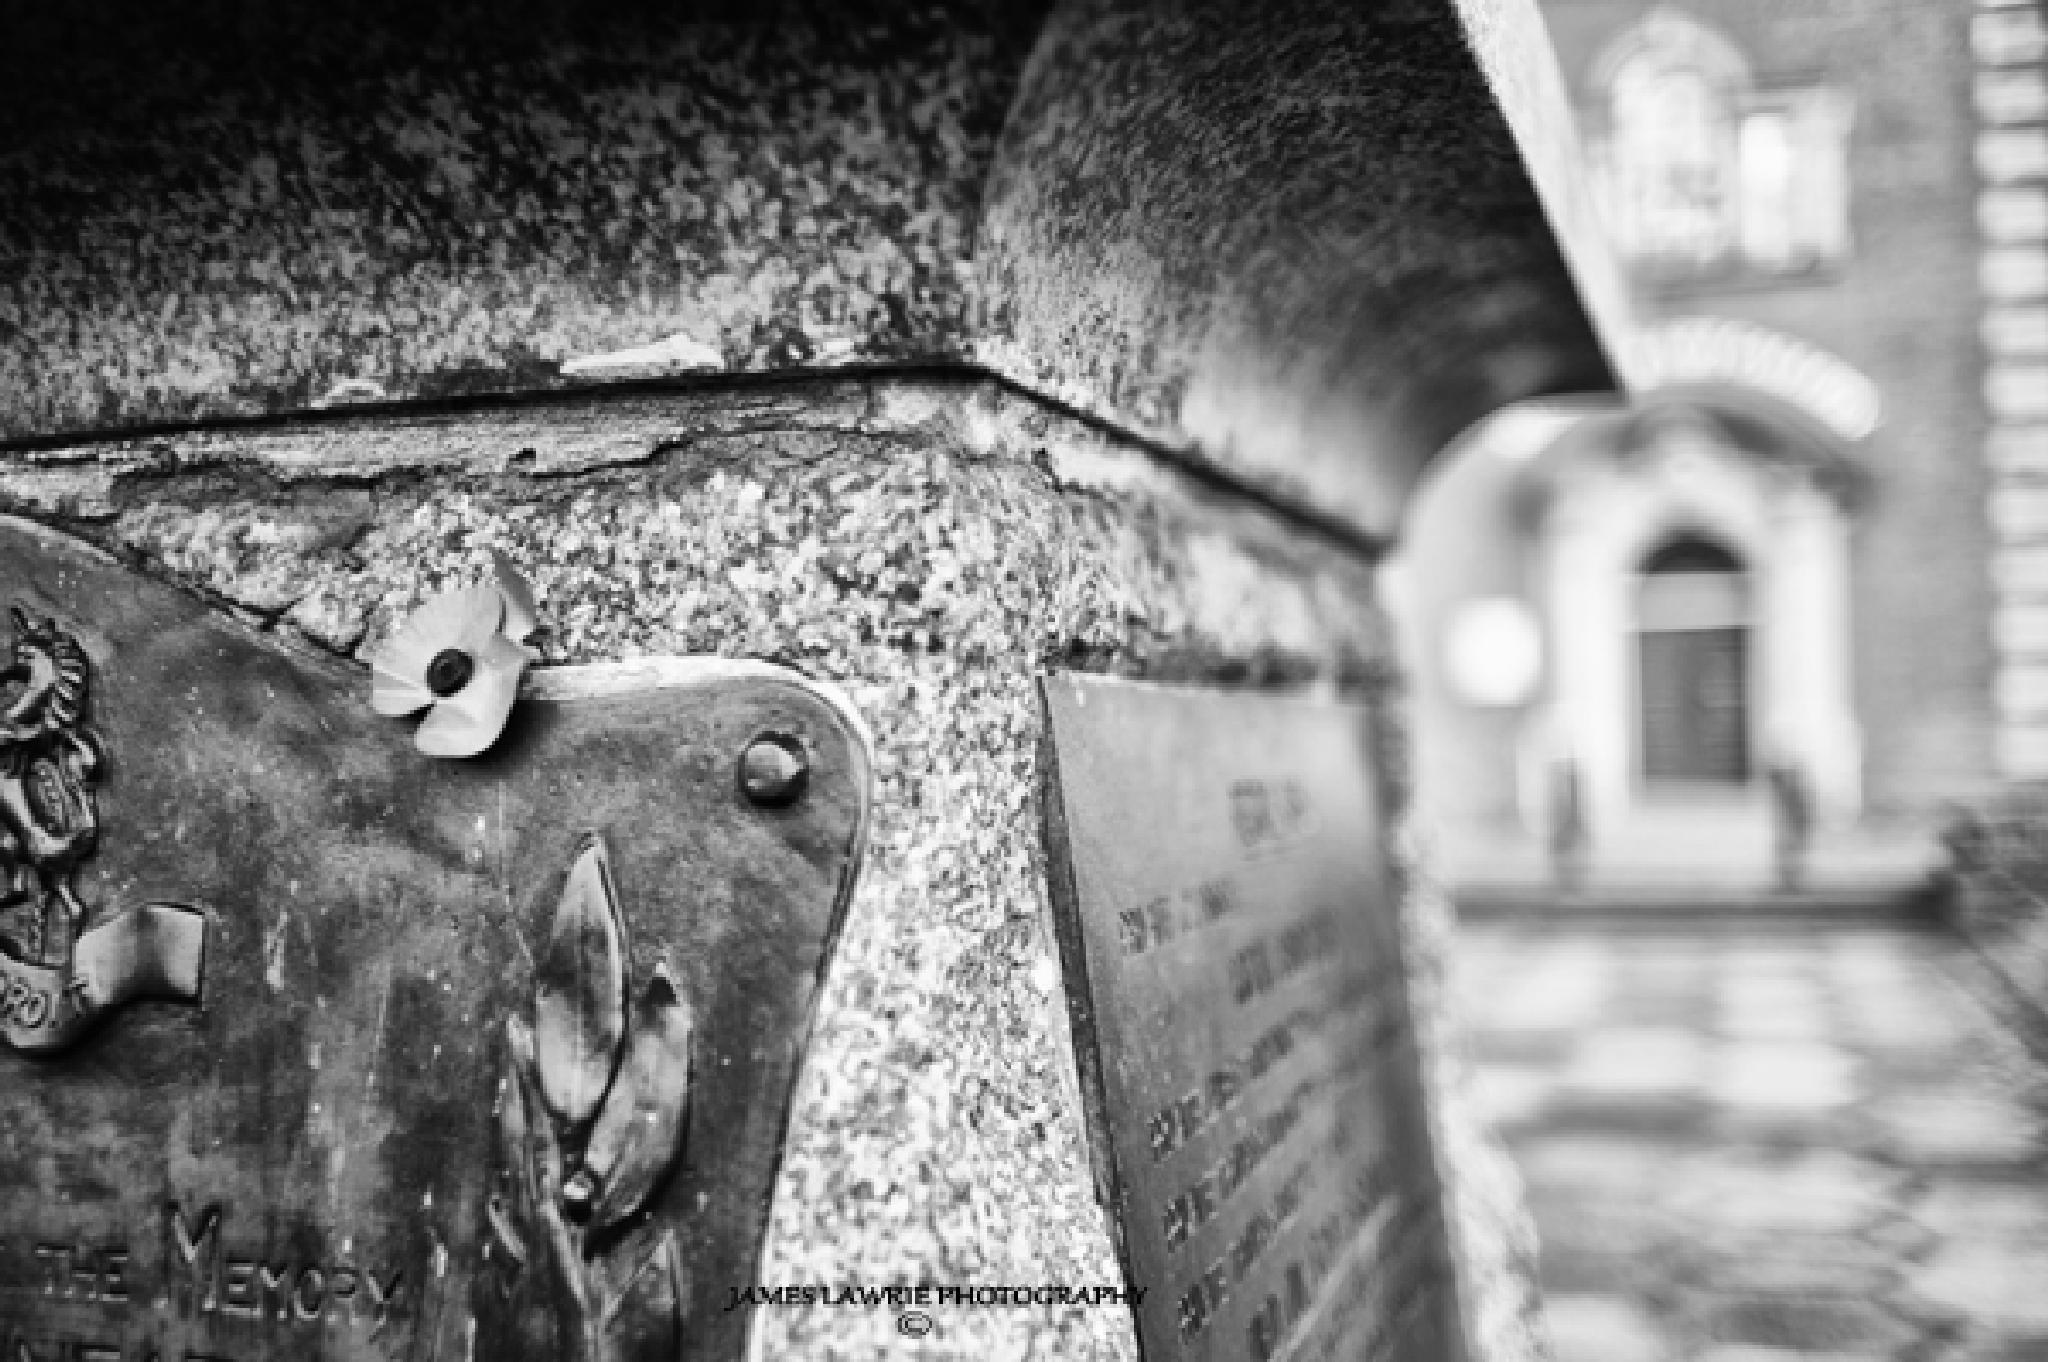 Memorial by James Lawrie